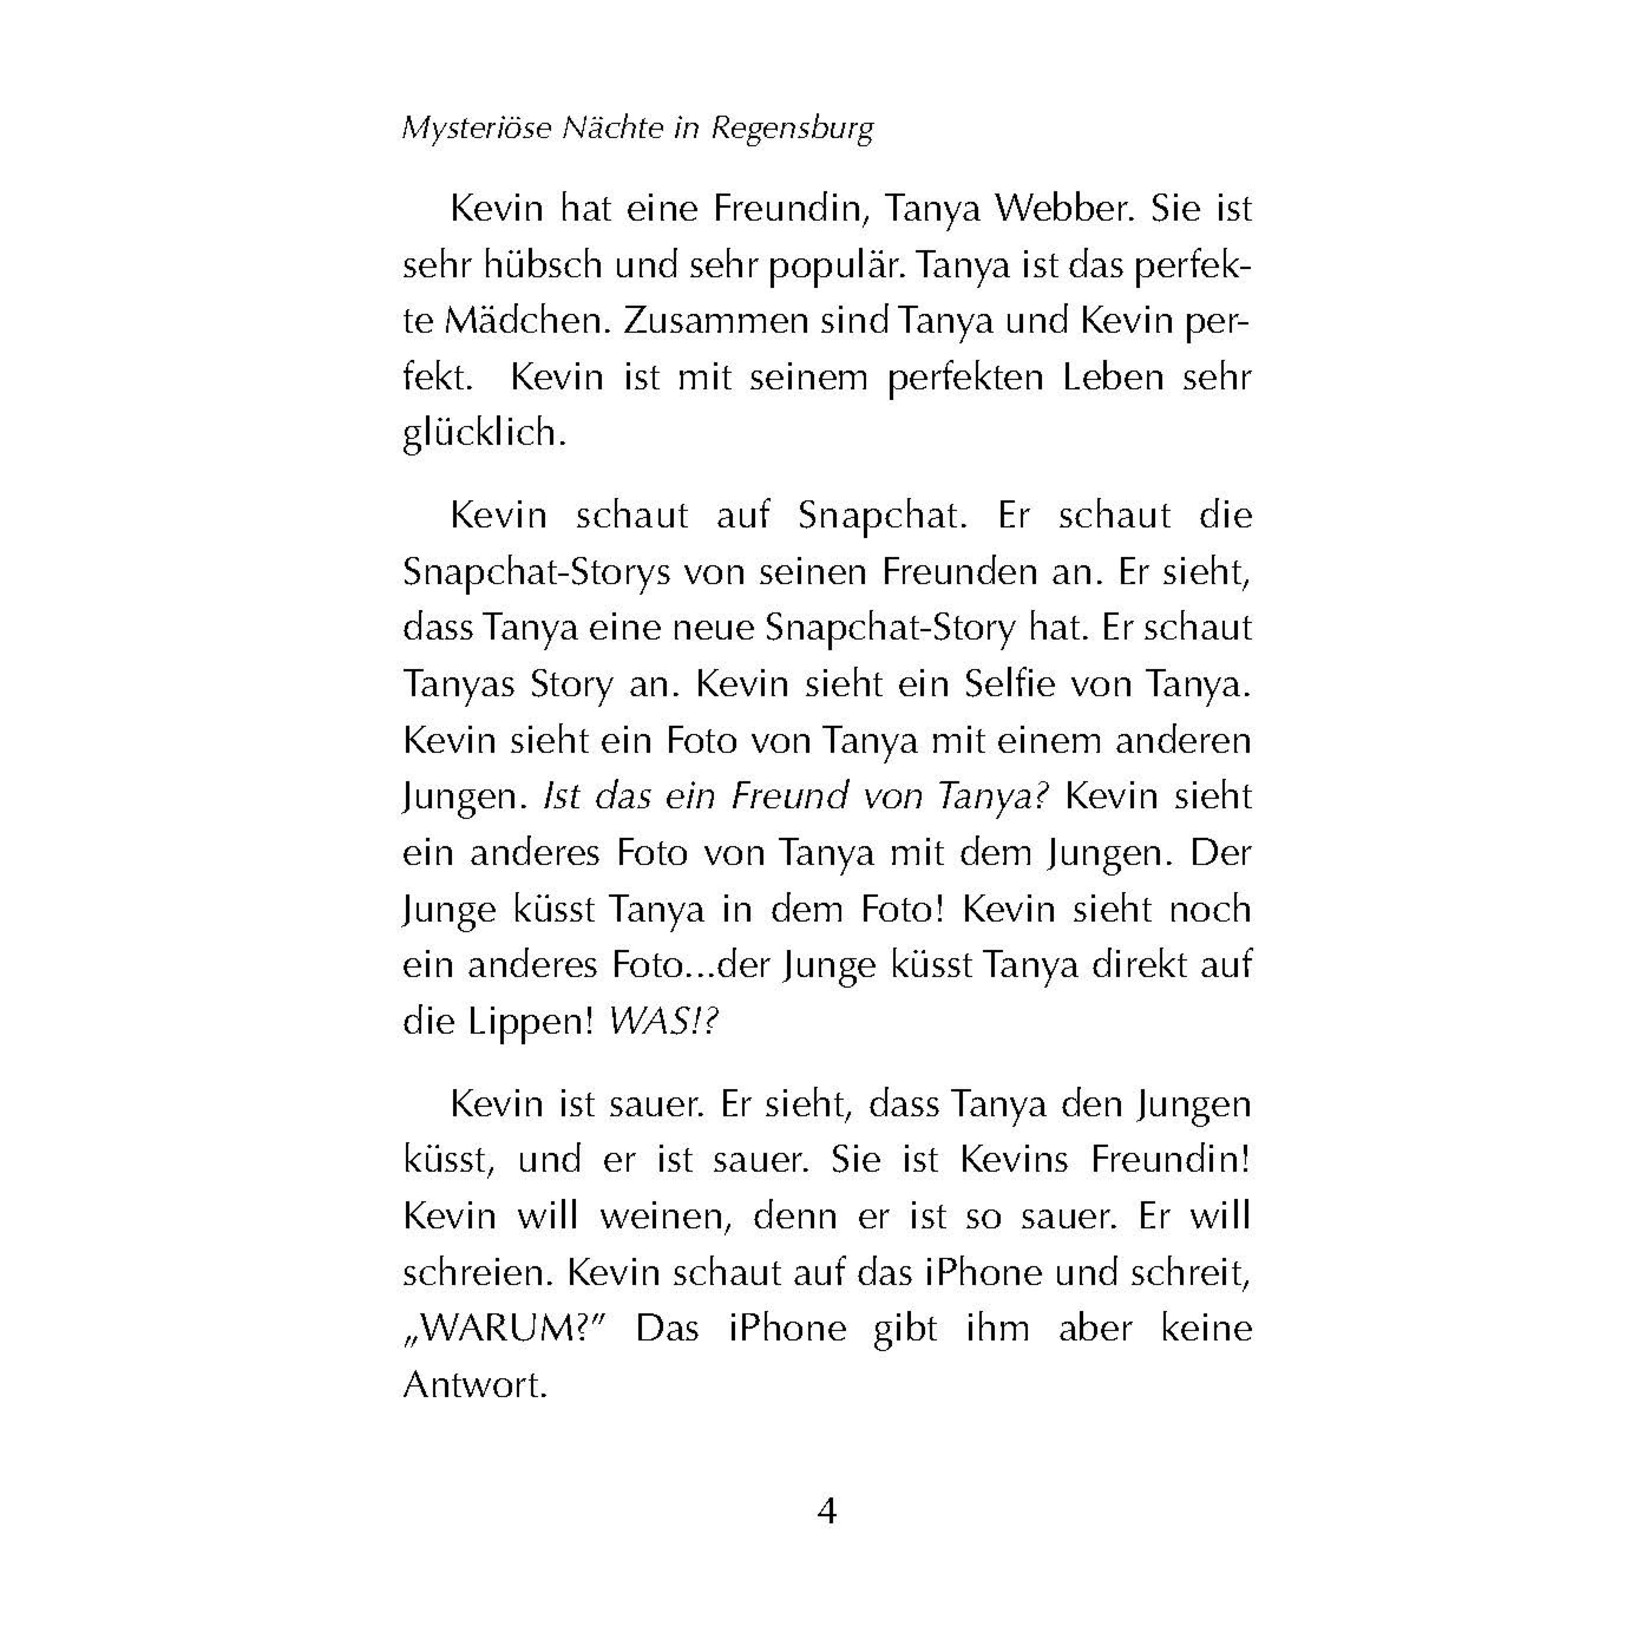 Fluency Matters Mysteriöse Nächte in Regensburg